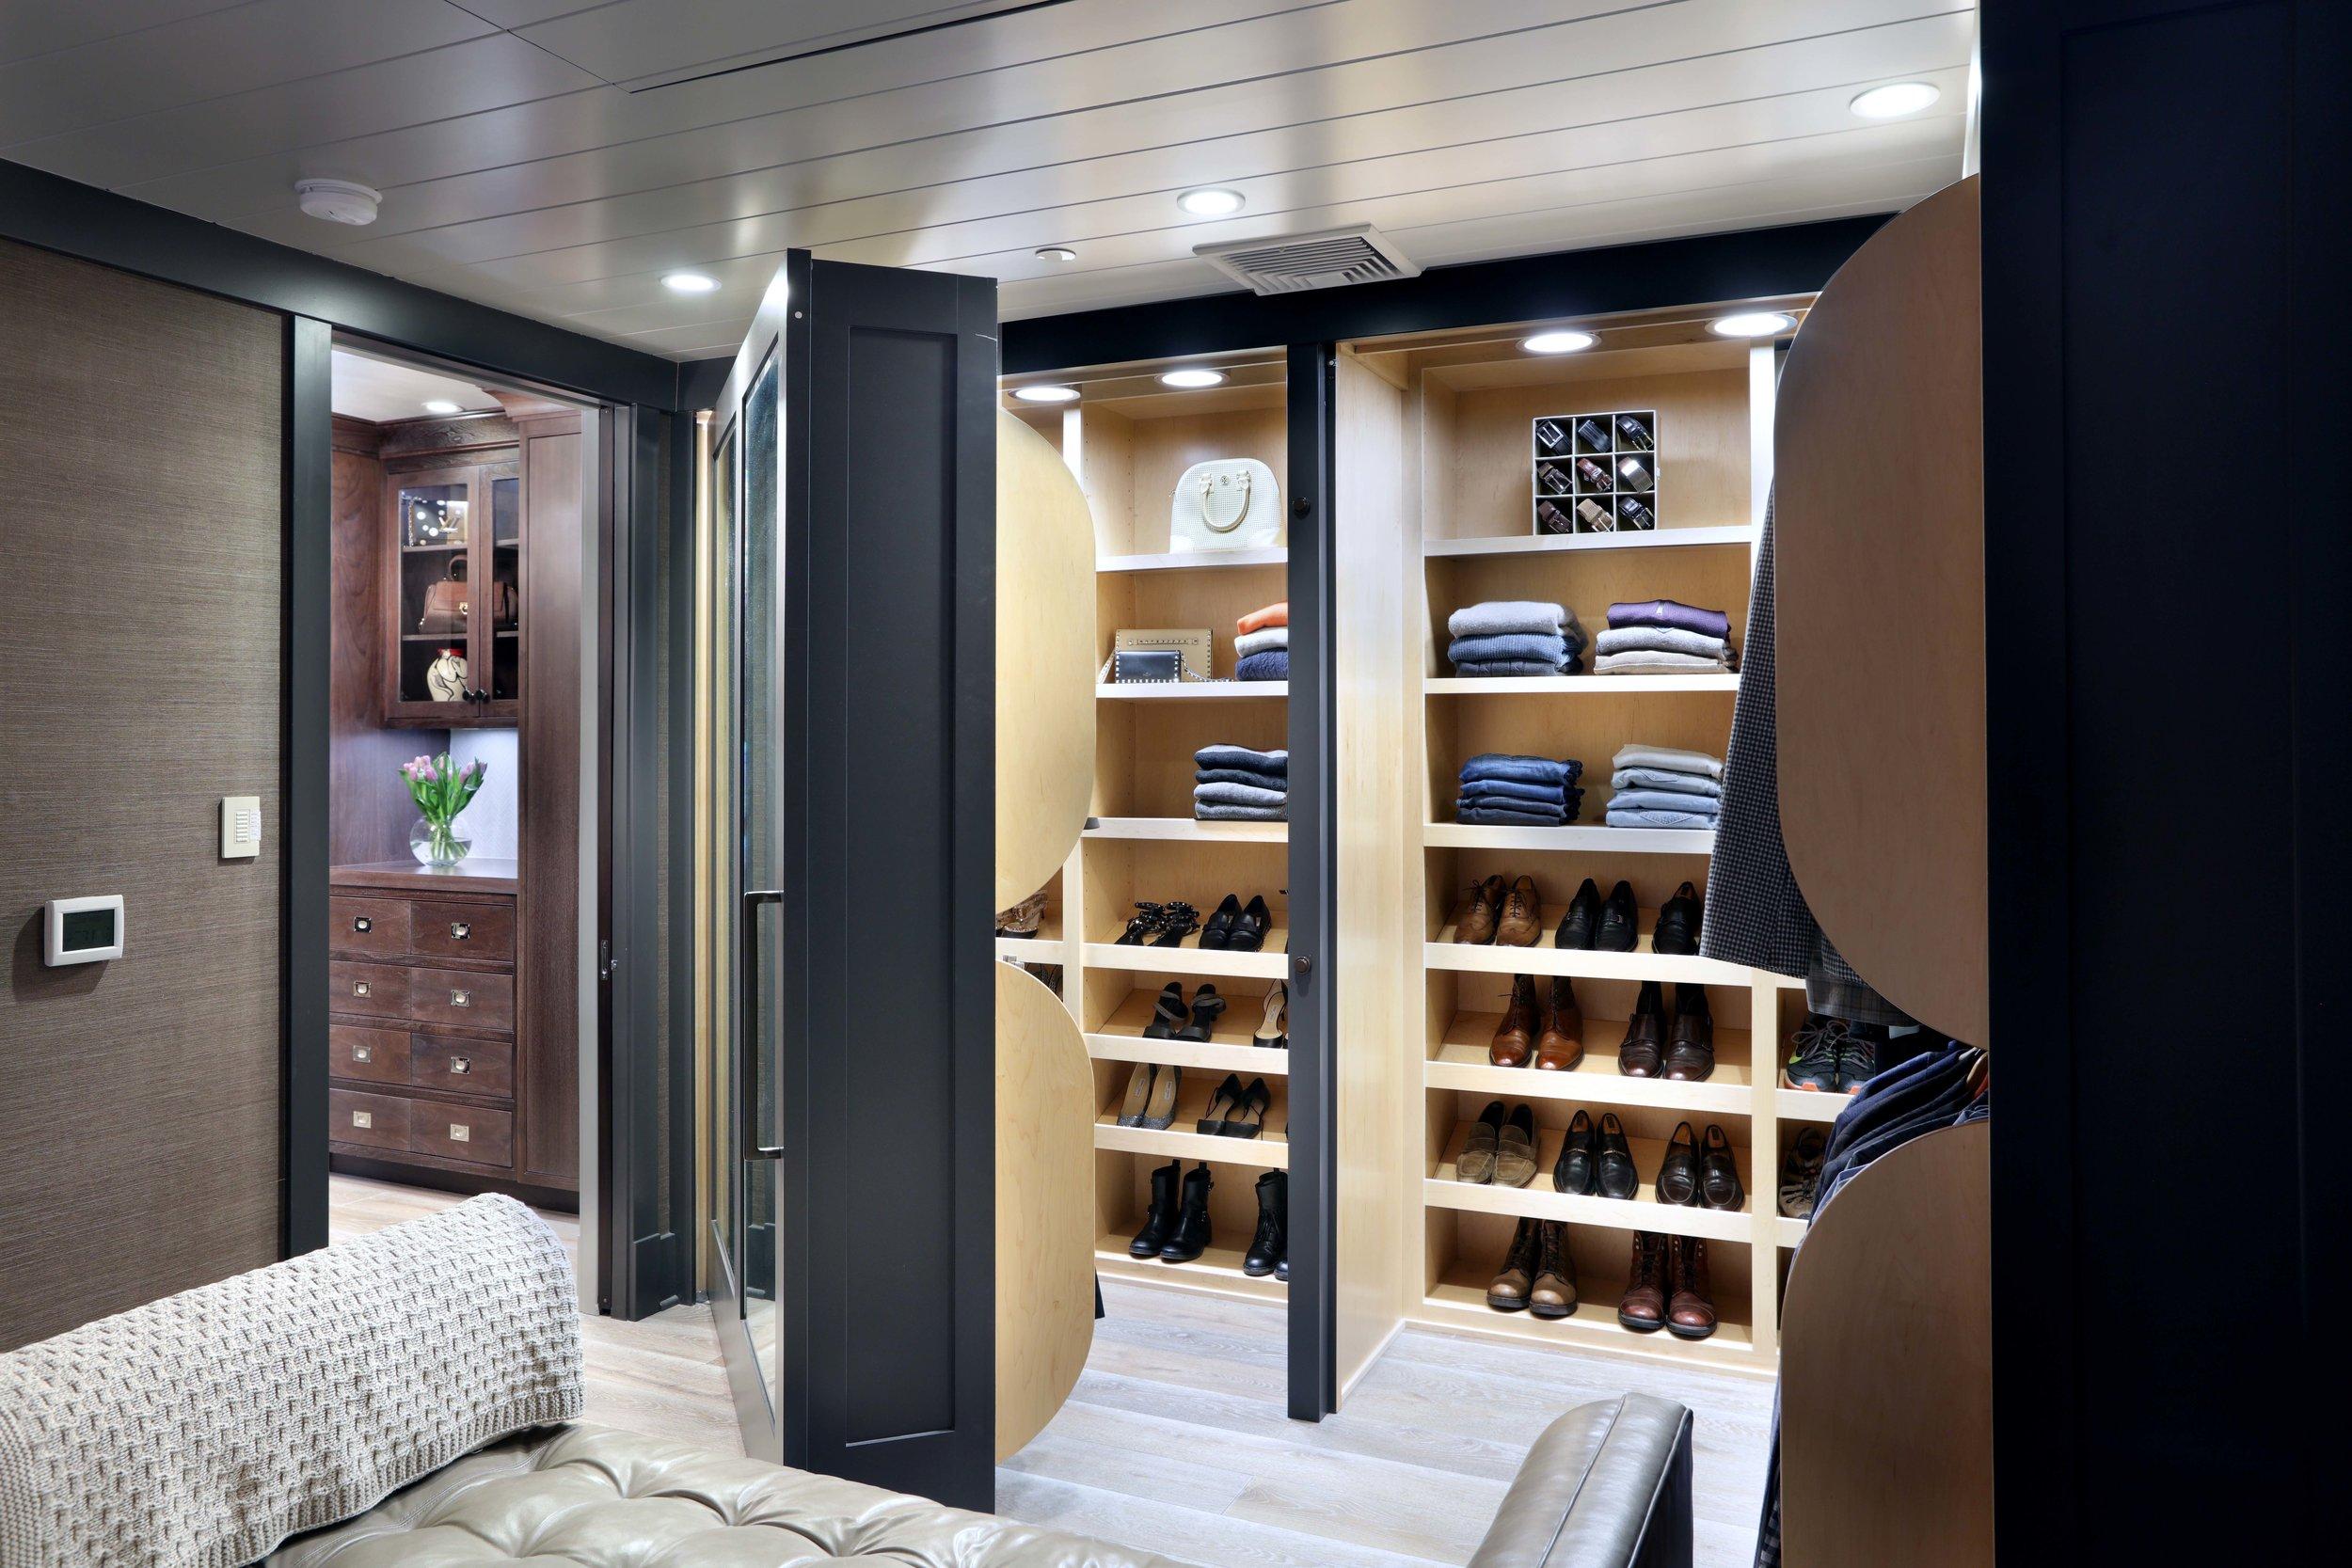 Vision-Interiors-Visbeen-Showroom-Grand-Rapids-Master-Residence-Closet.jpg